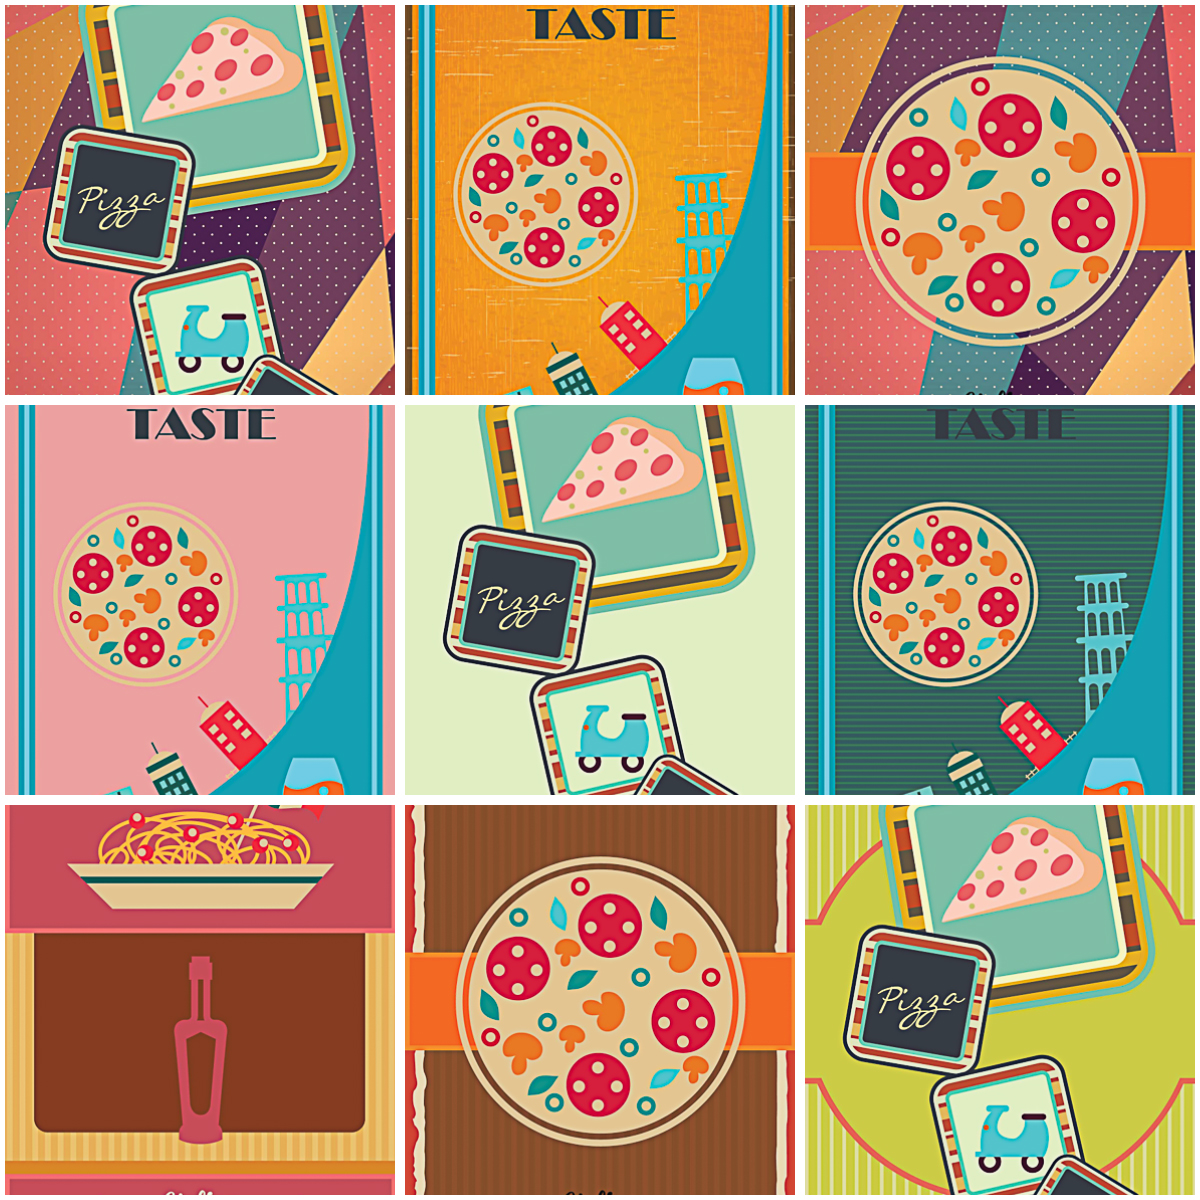 Italian pizzeria menu template lovely set vector